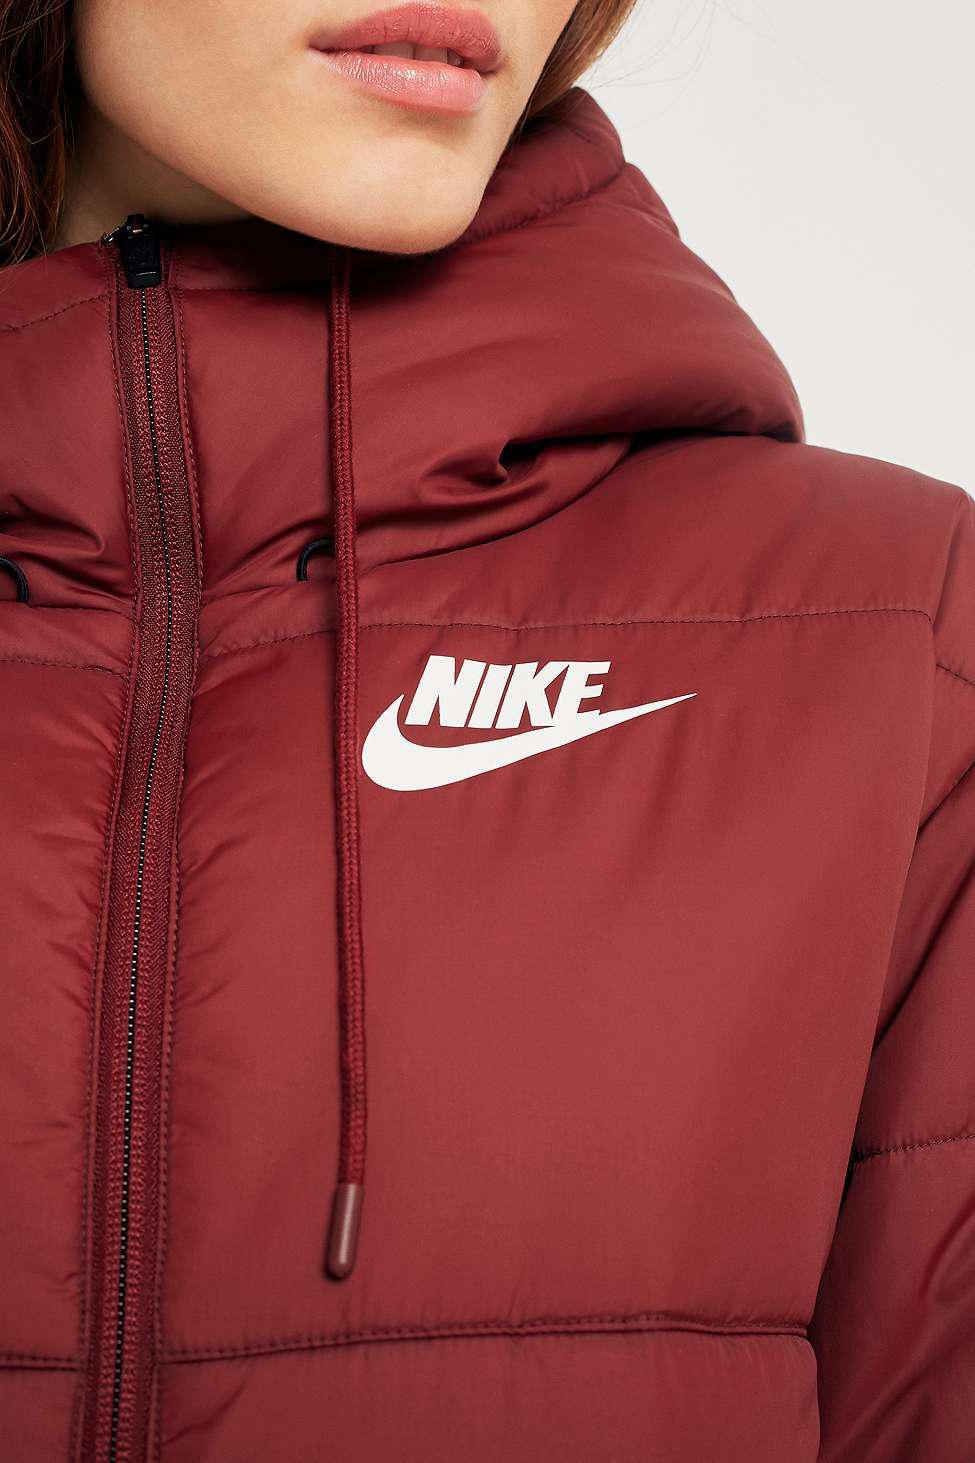 fc57a5a7e014 Nike Sportswear Advance 15 Red Puffer Coat - Womens S in Red - Lyst